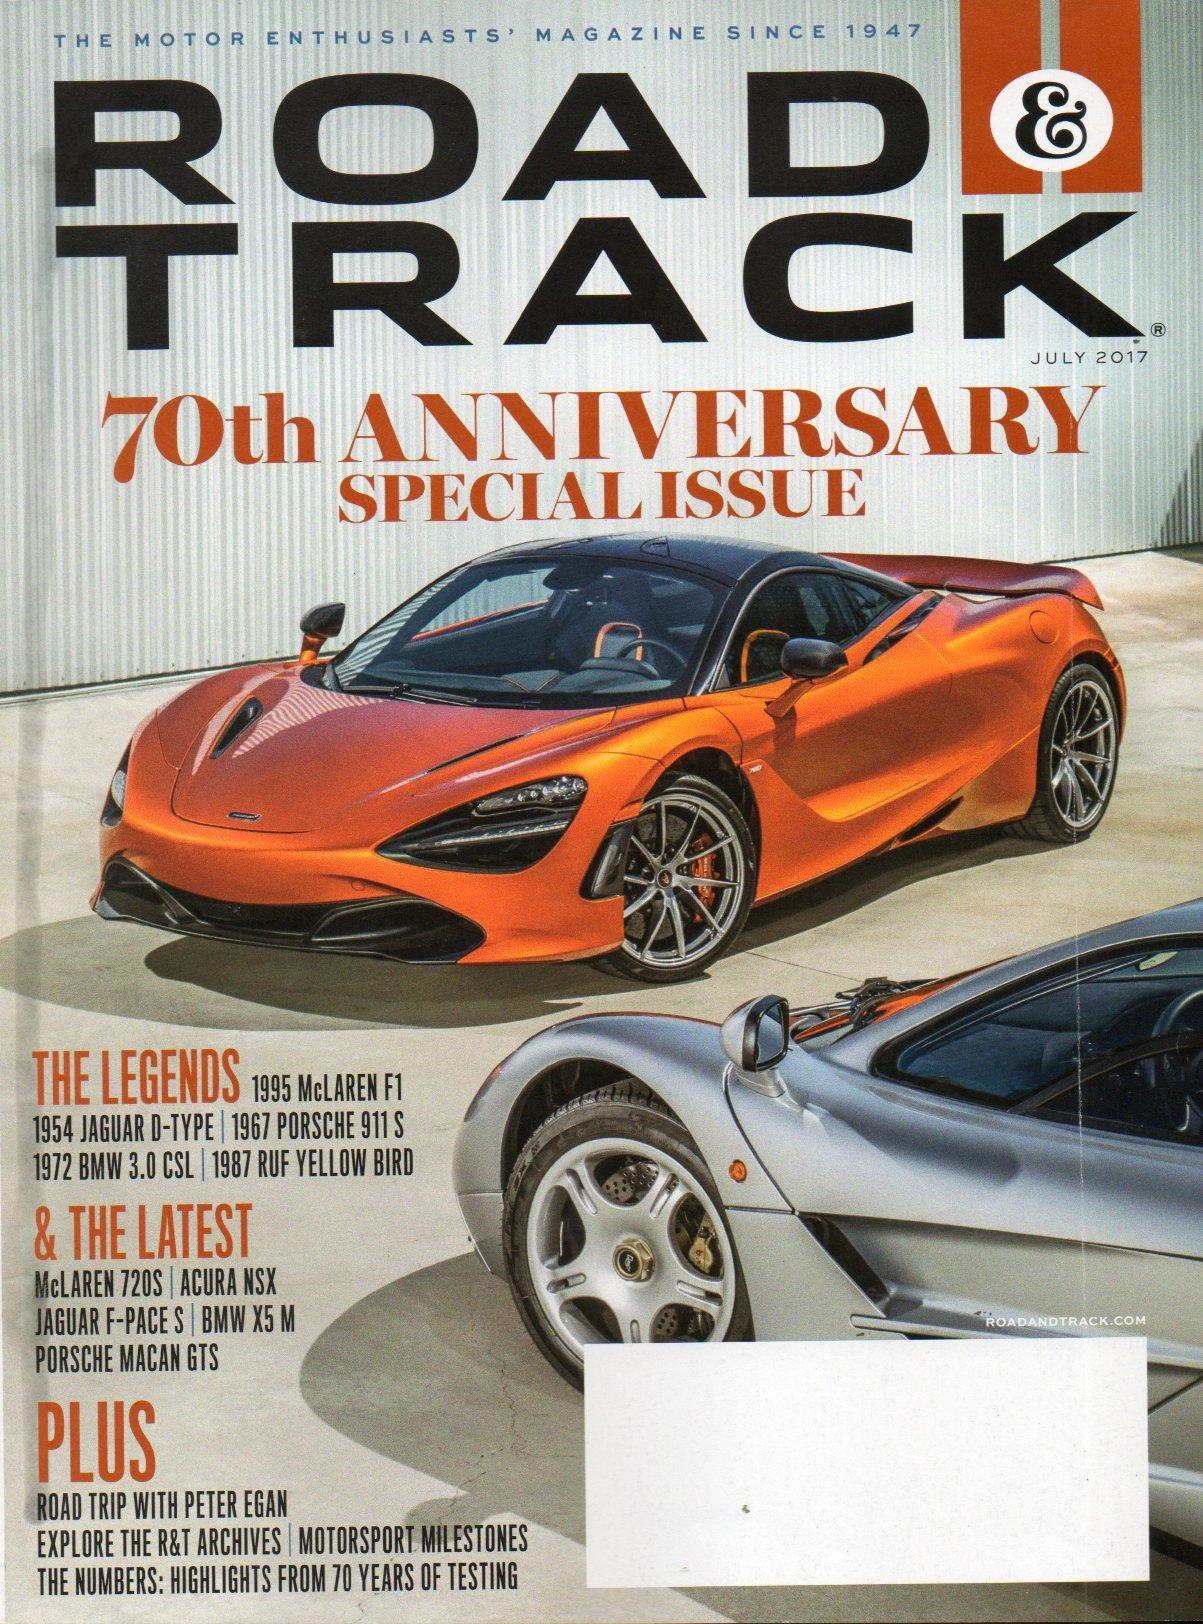 Road & Track 2017 Magazine THE LEGENDS: 1995 McLAREN F1 1954 JAGUAR